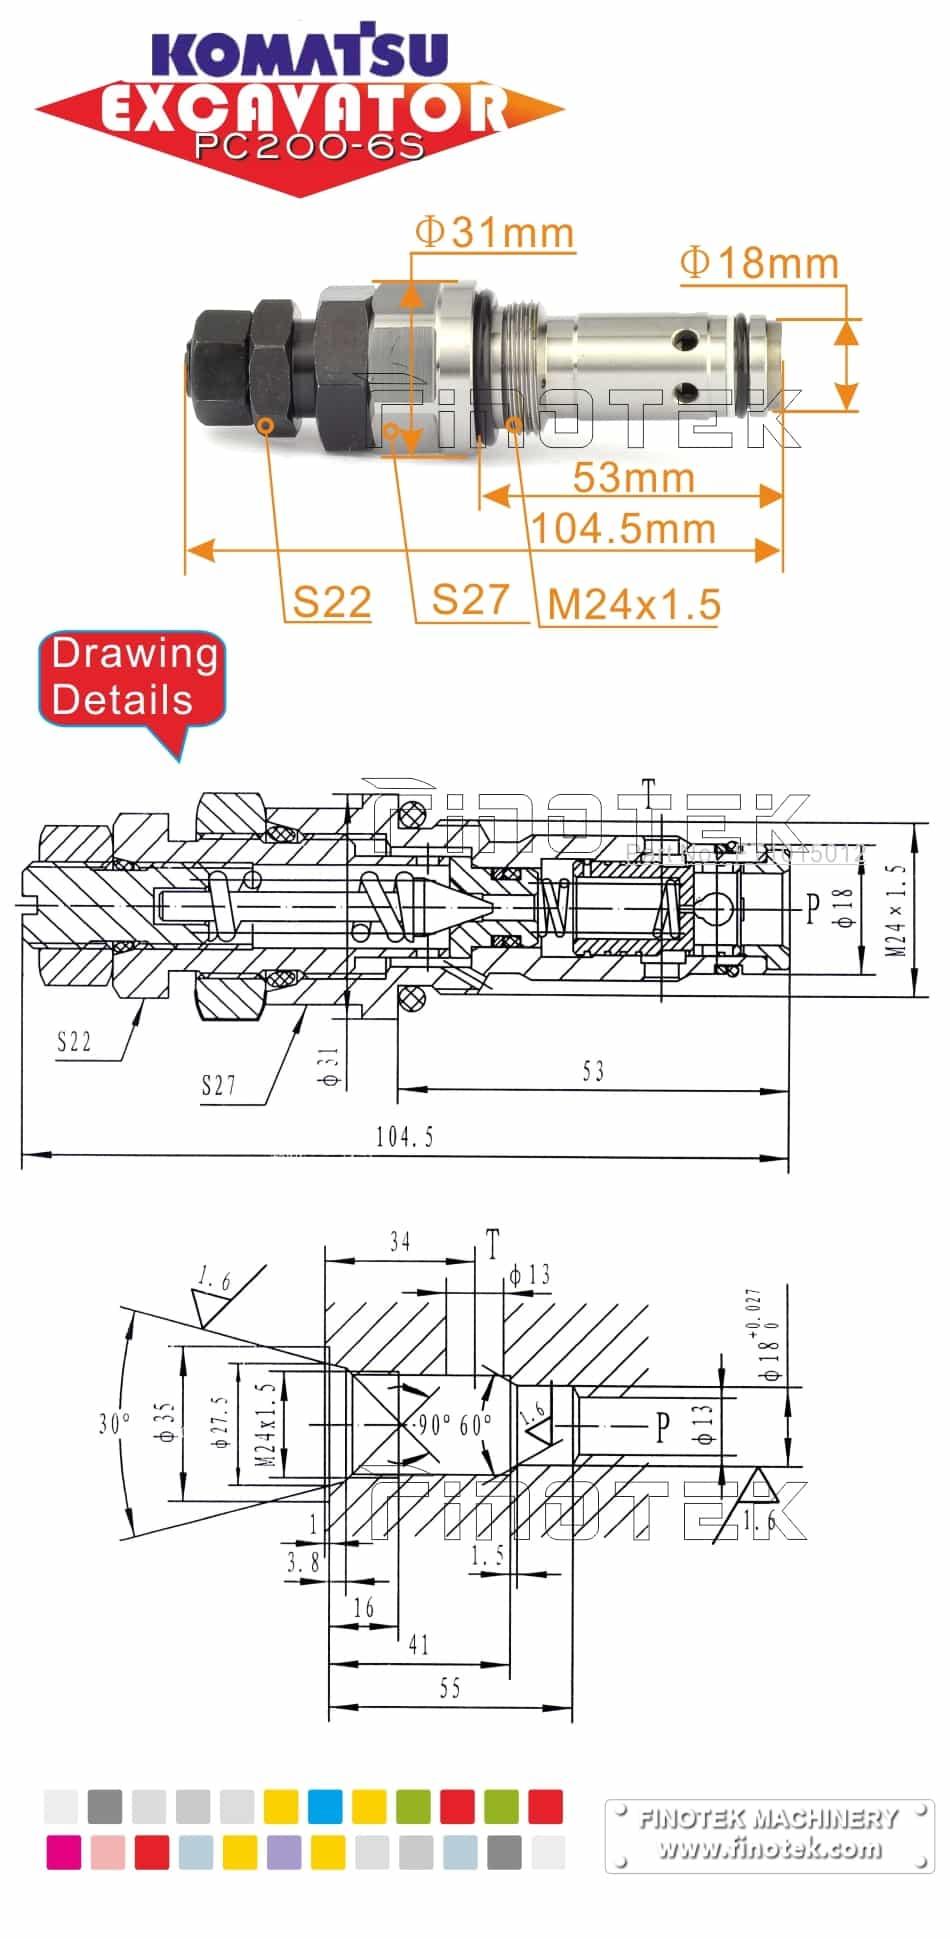 medium resolution of  komatsu hydraulic control valve for excavator pc200 6s main valve dimensions